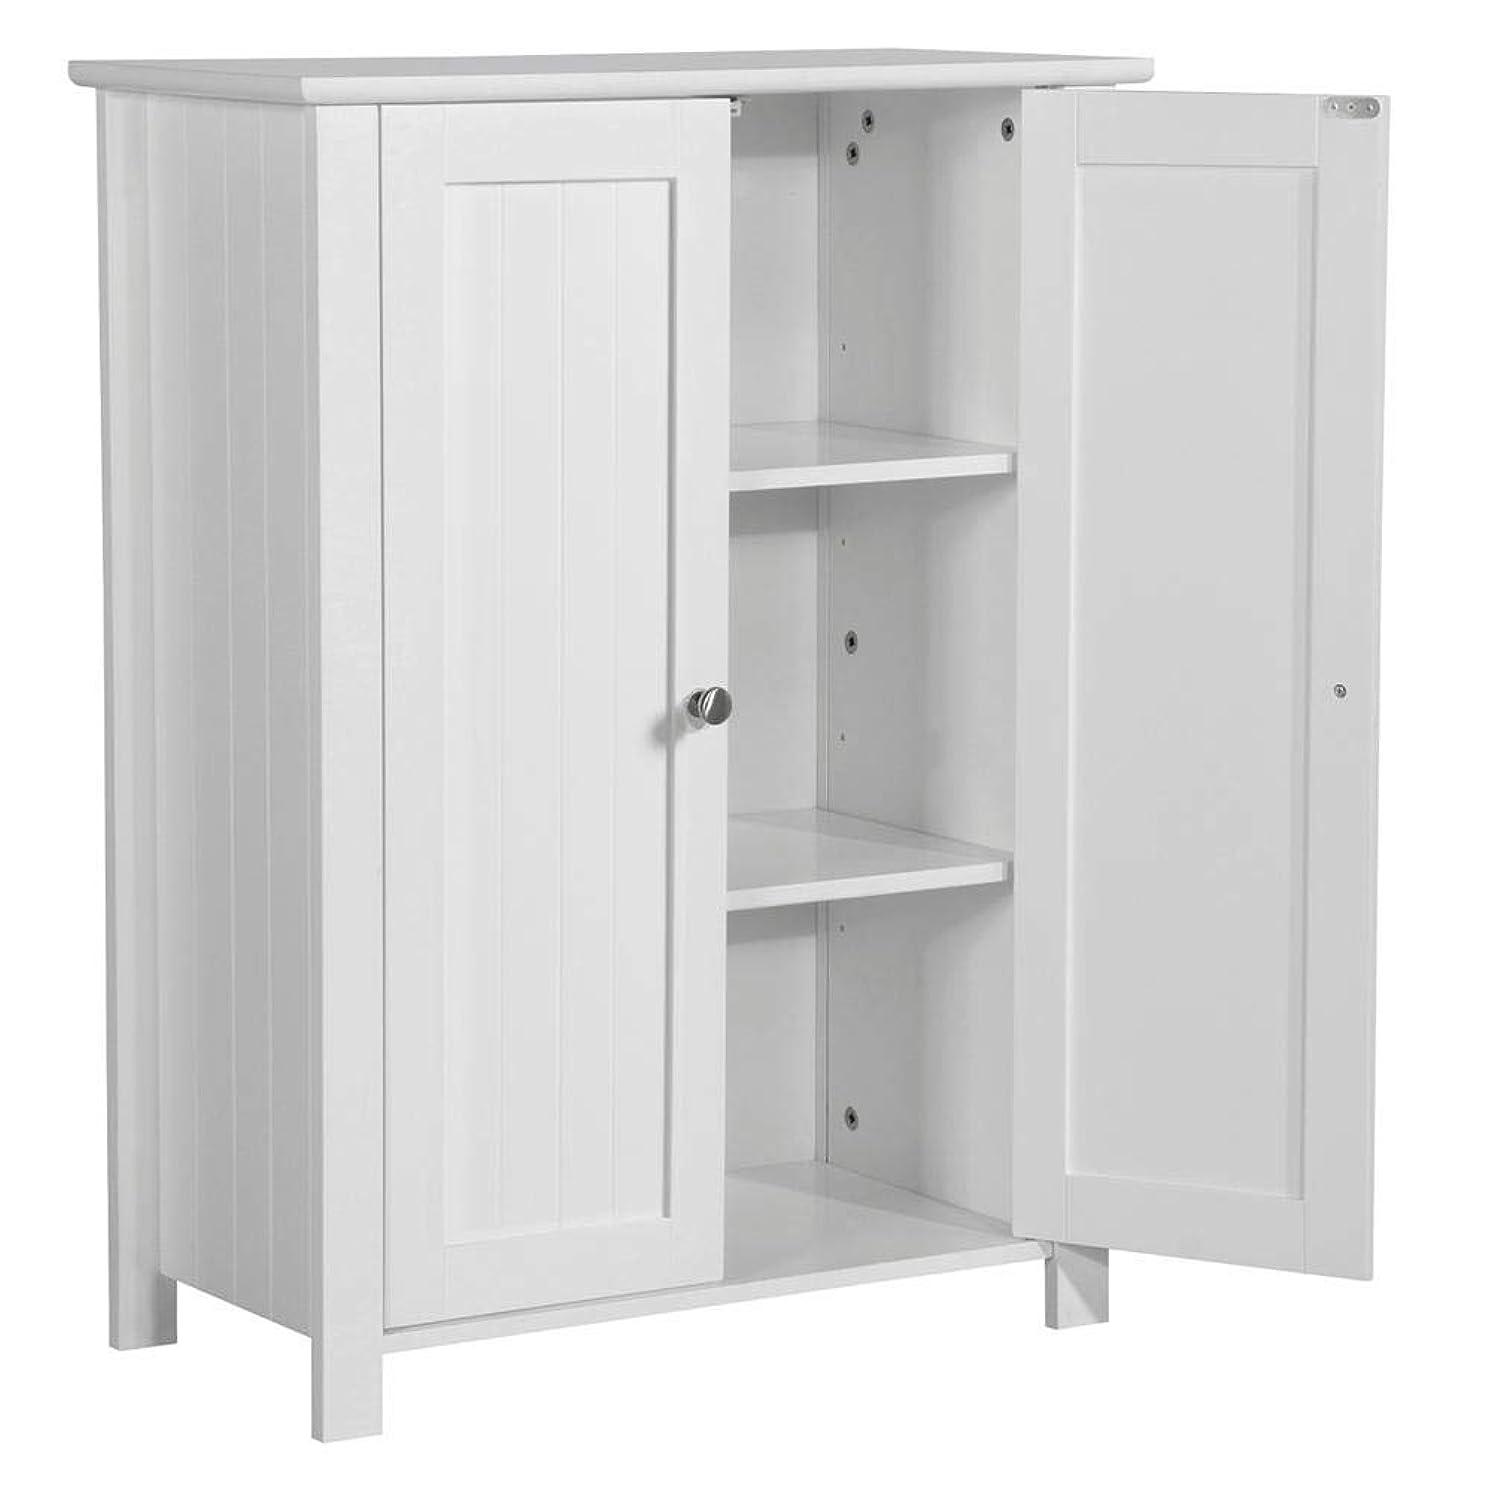 "Topeakmart 31.5""H Bathroom Floor Cabinet Free Standing 2-Door Storage Cabinet with 2 Adjustable Shelves, Anti-toppling Design, White qs350512197090"